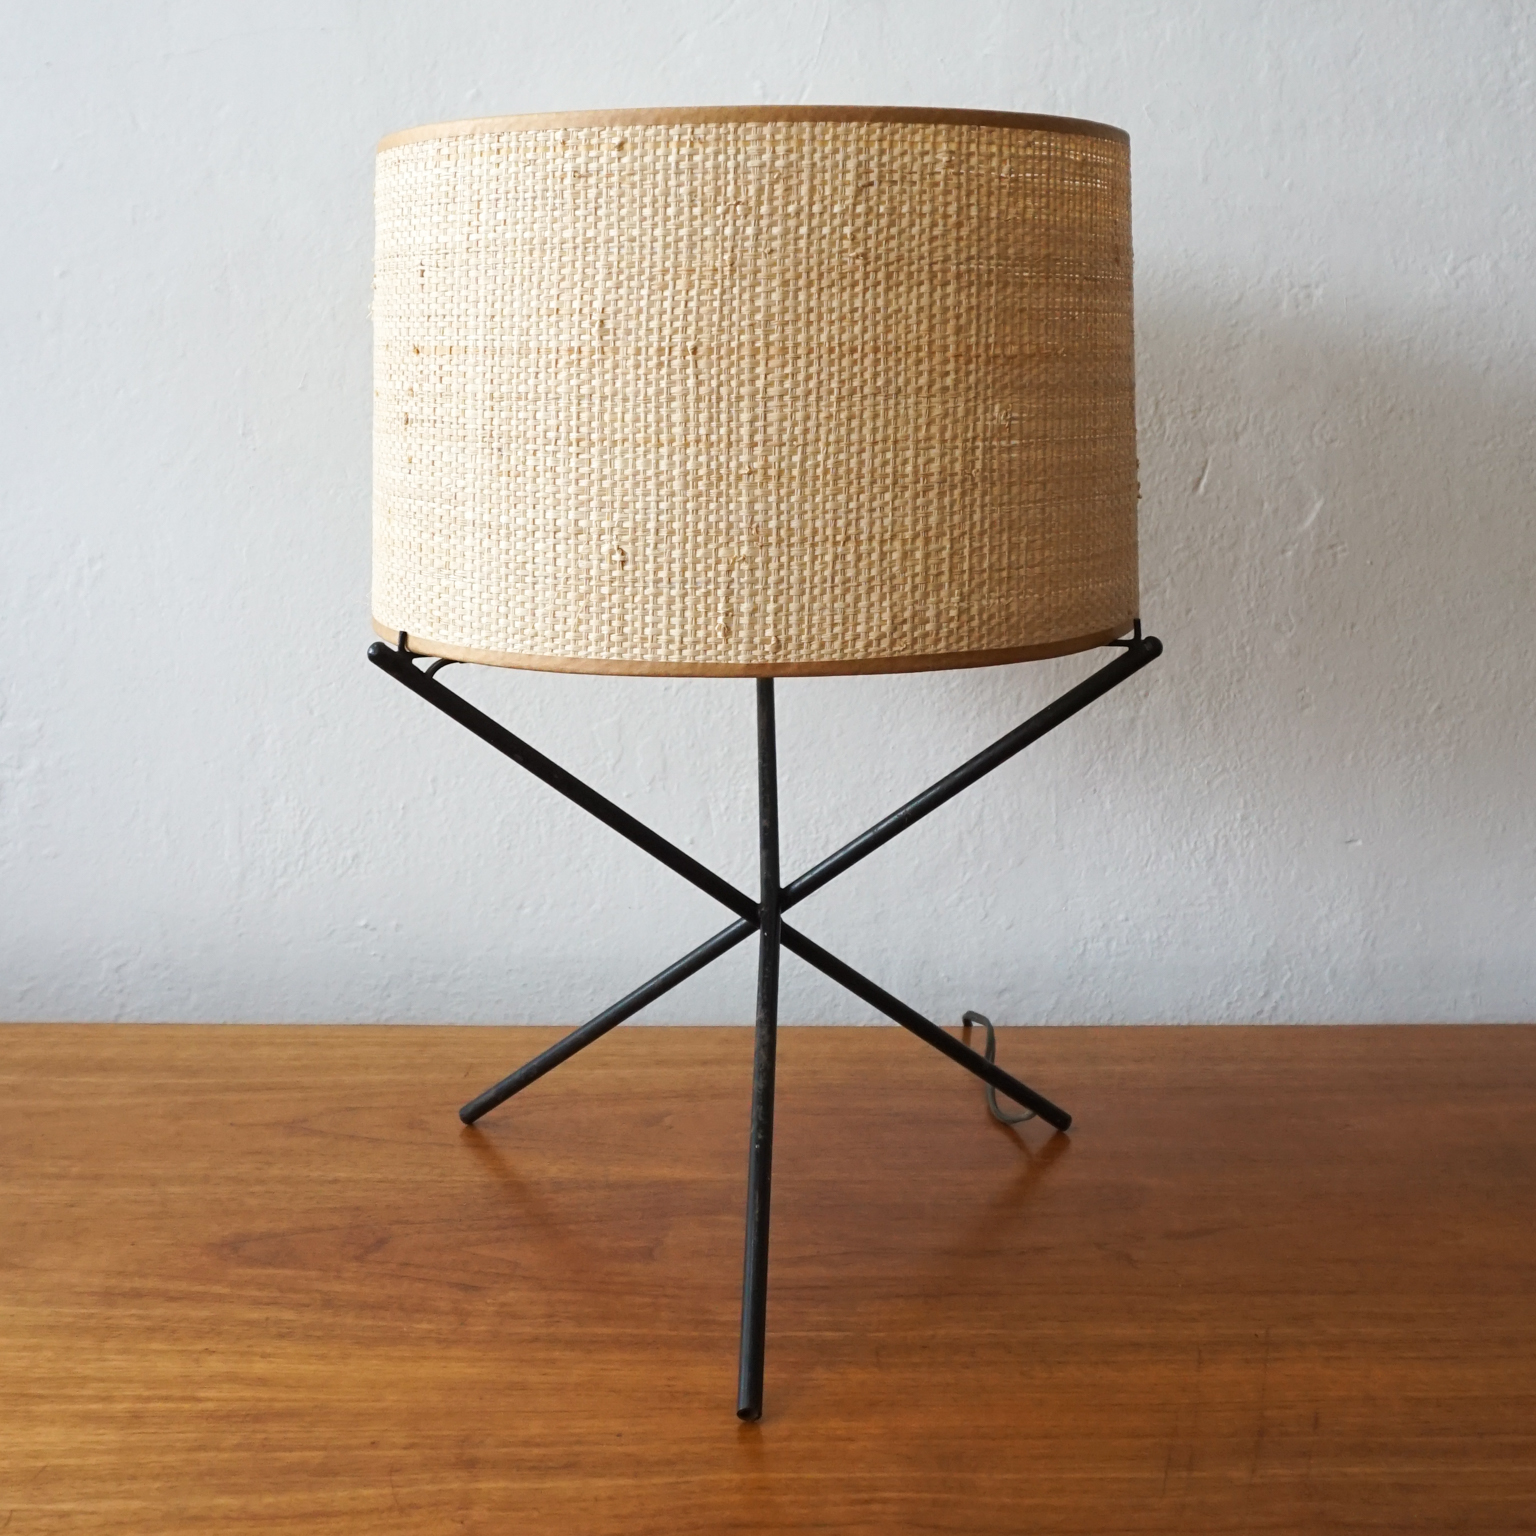 1950s Iron Tripod Table Lamp Esoteric Survey